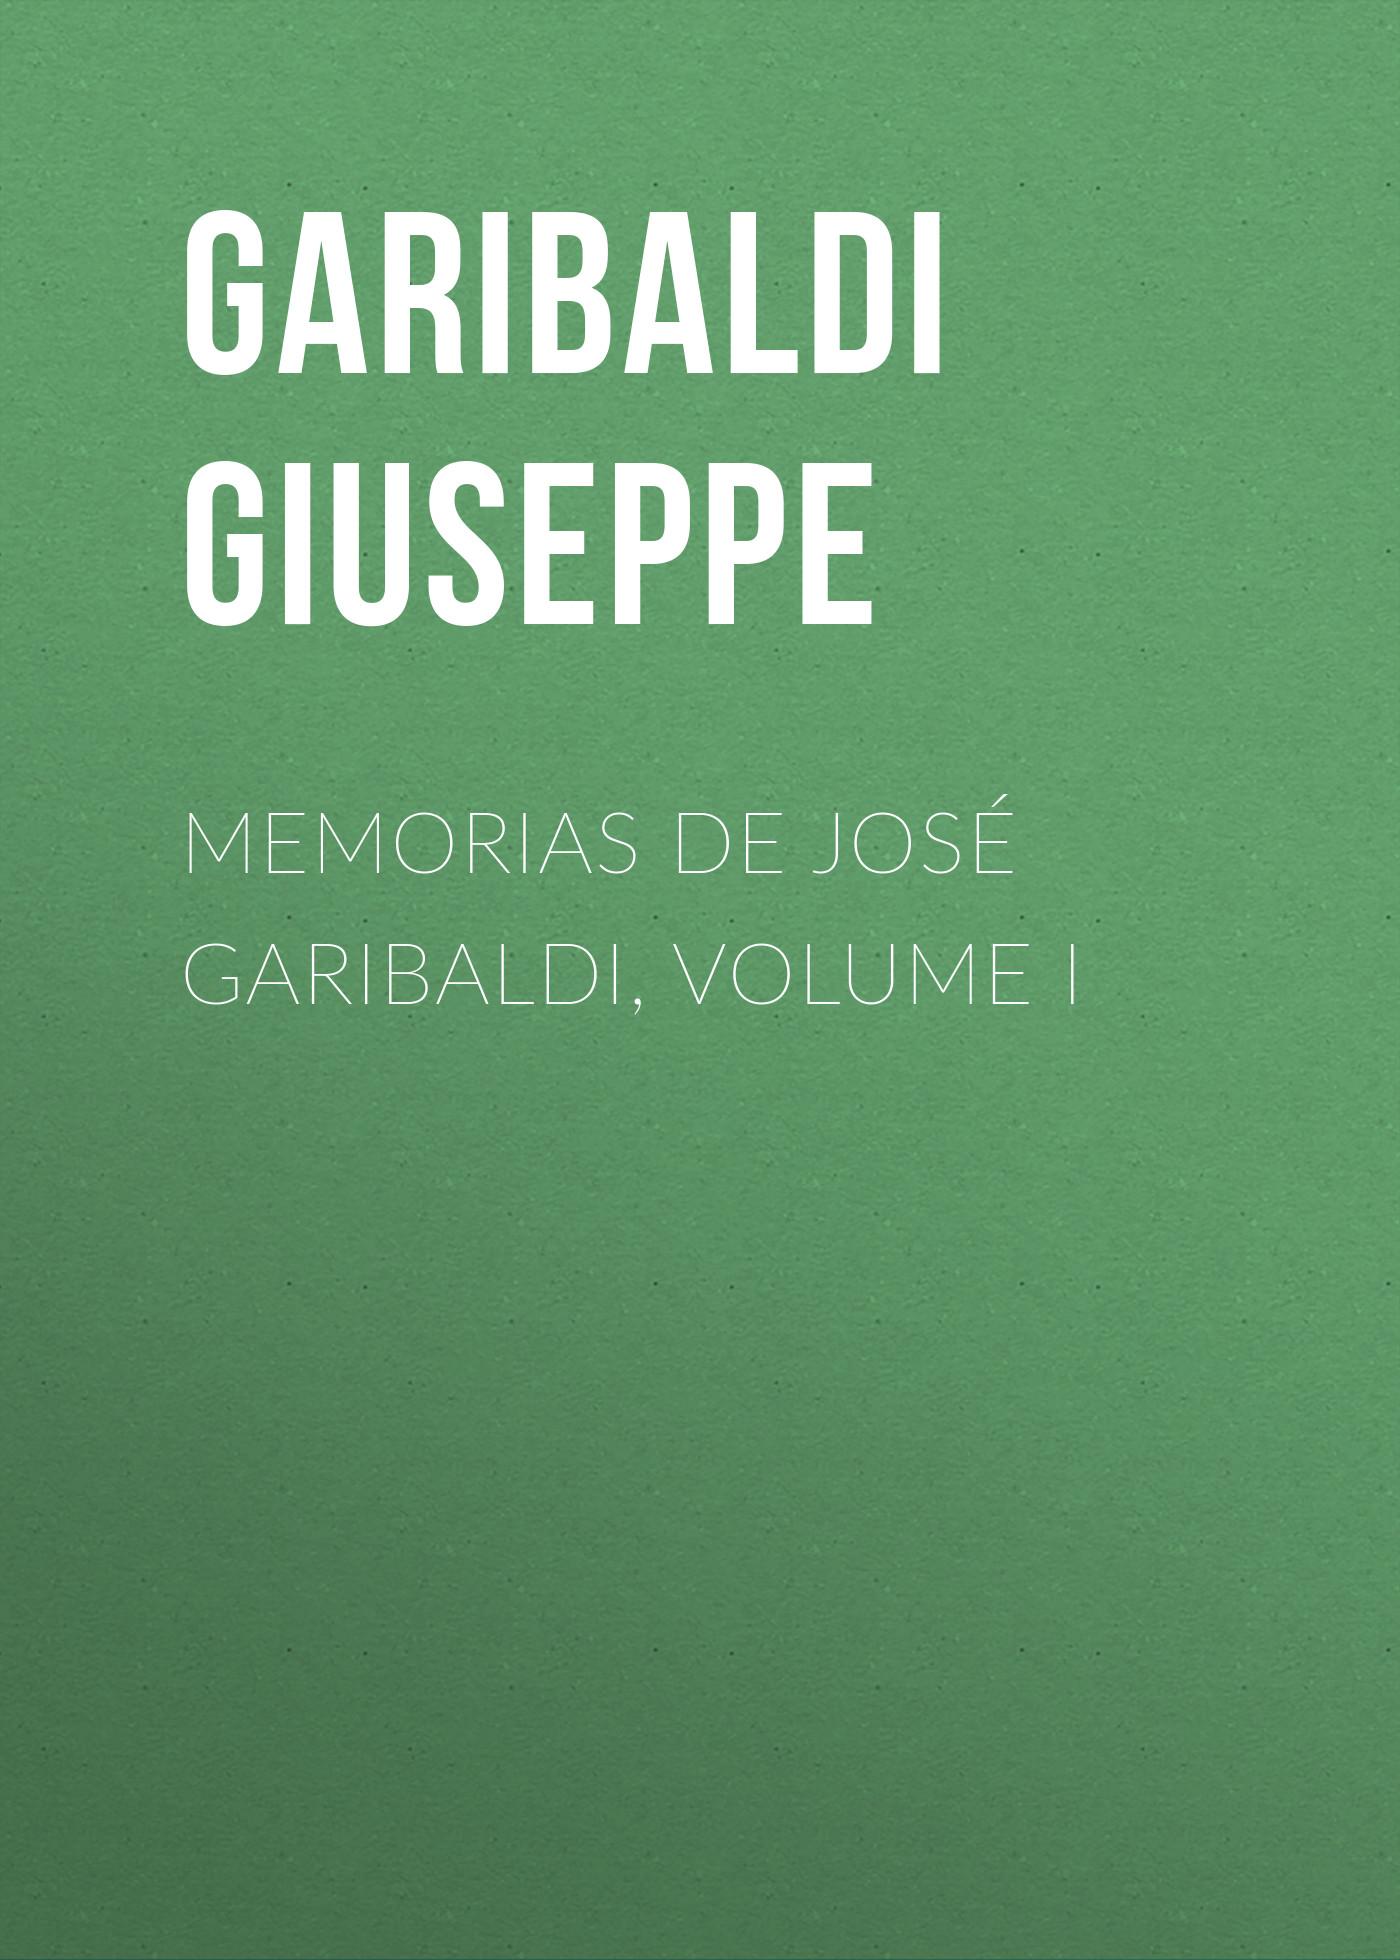 Garibaldi Giuseppe Memorias de José Garibaldi, volume I